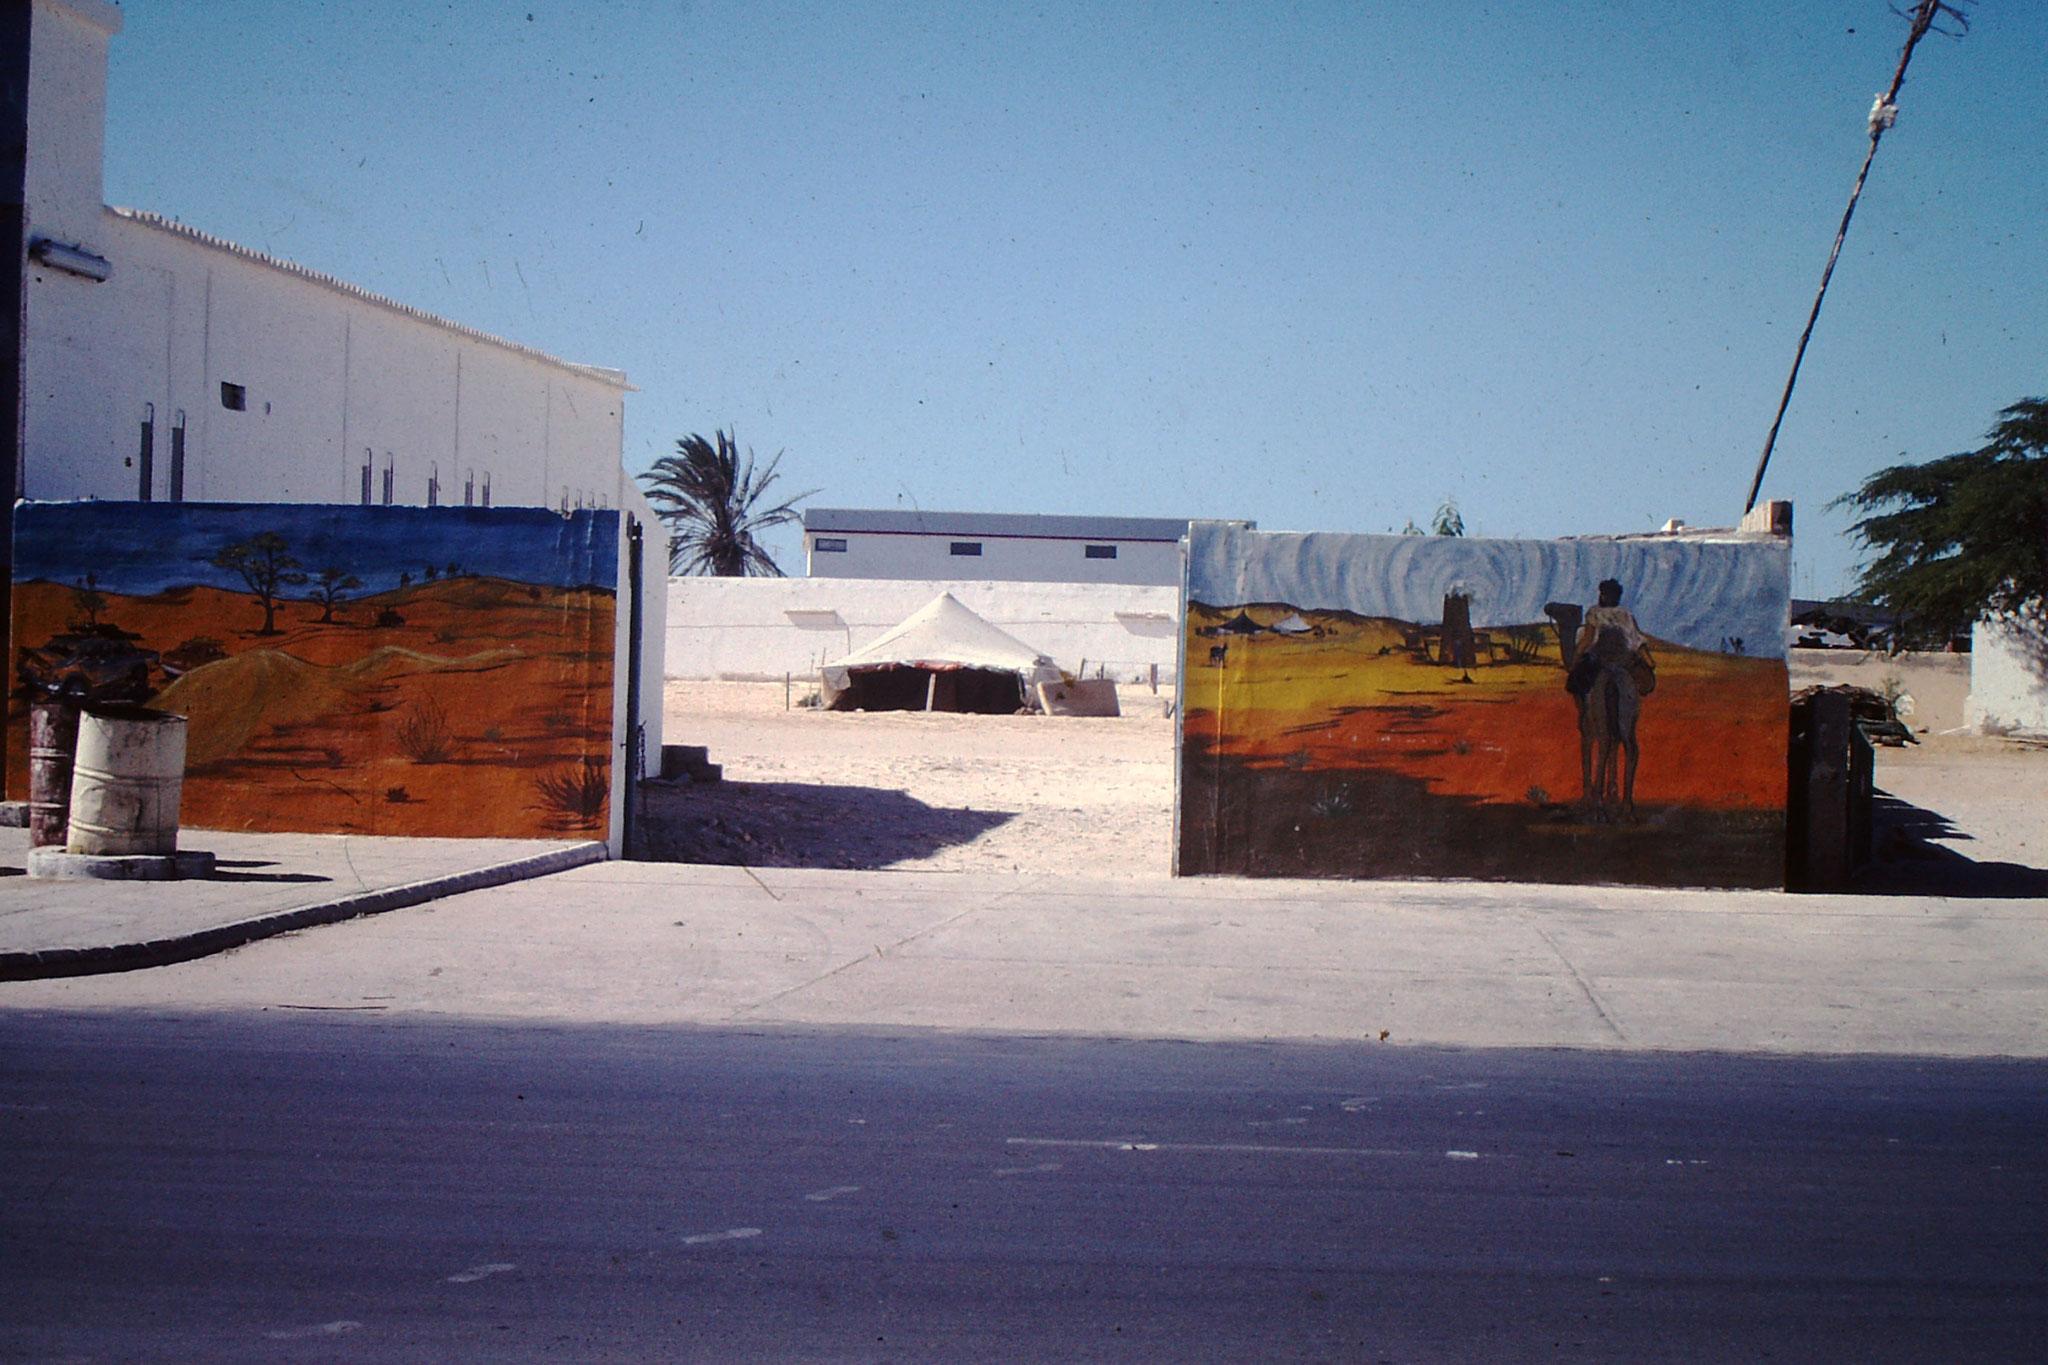 Campingplatz in Nouakchott.